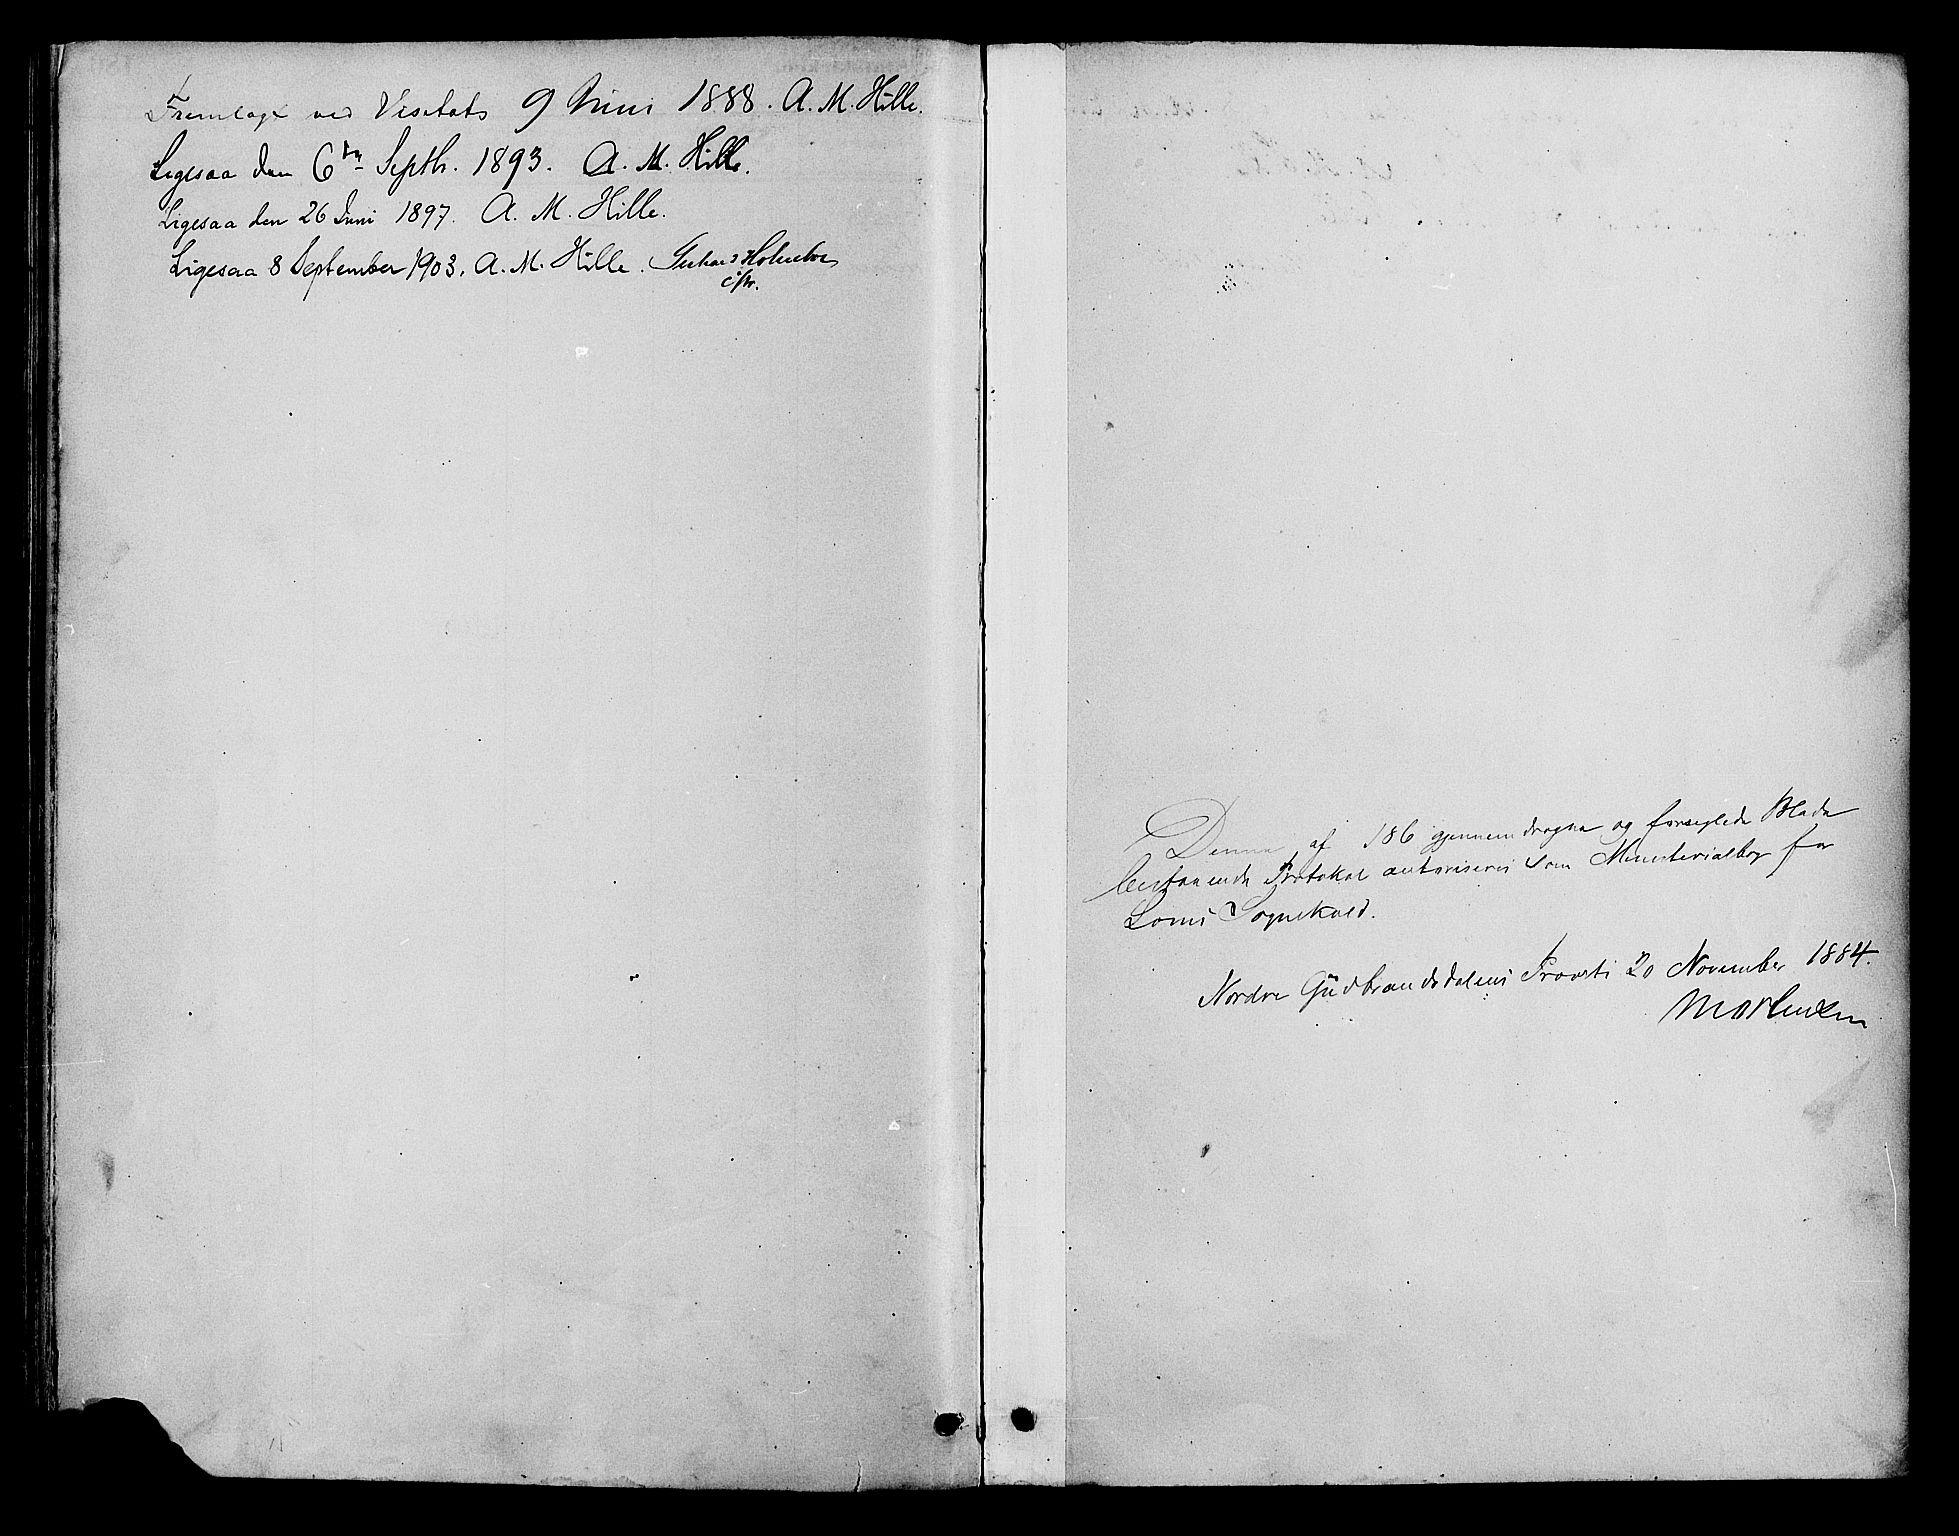 SAH, Lom prestekontor, K/L0008: Parish register (official) no. 8, 1885-1898